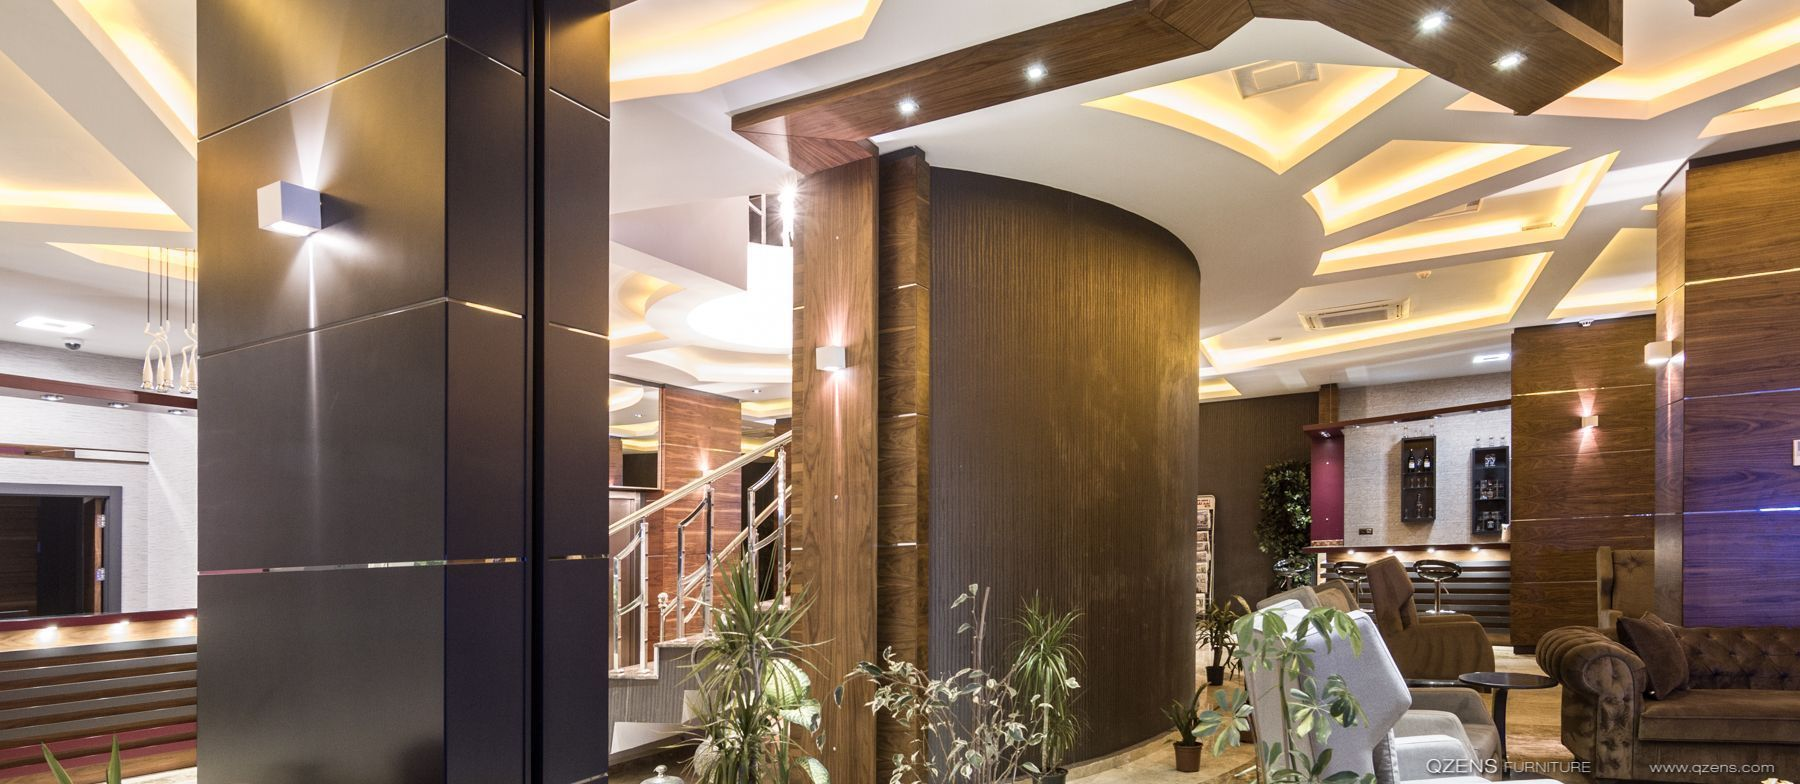 MEVA HOTEL - Qzens